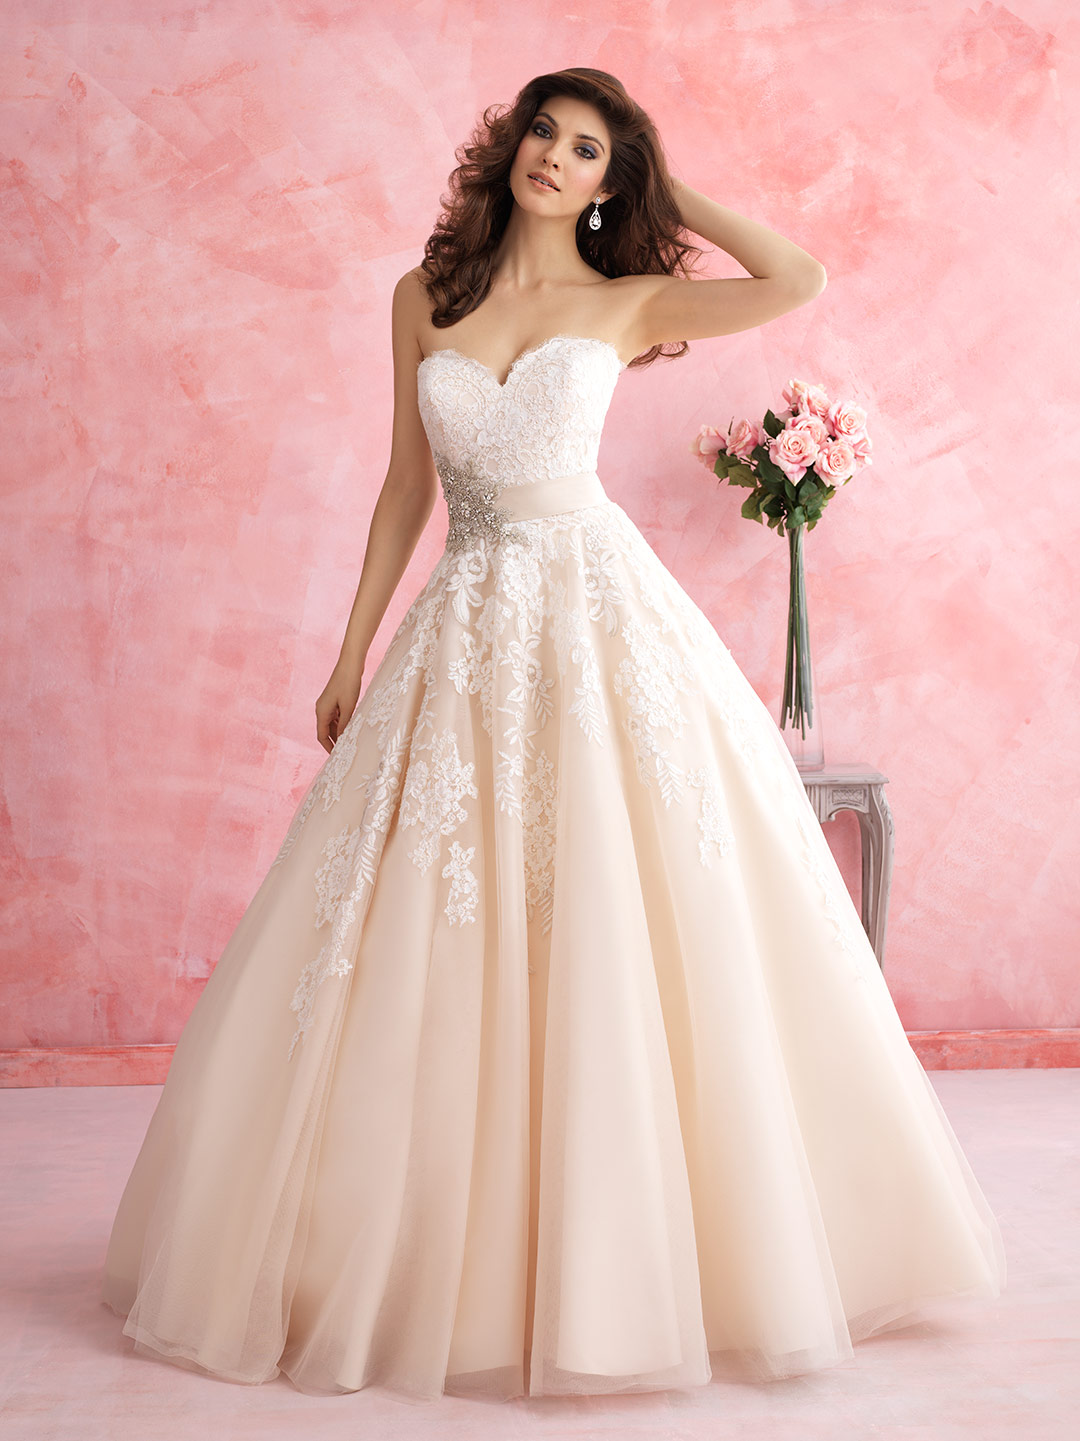 The Bridal Showroom Launches Allure Bridal 2015 – Wedding Dresses ...